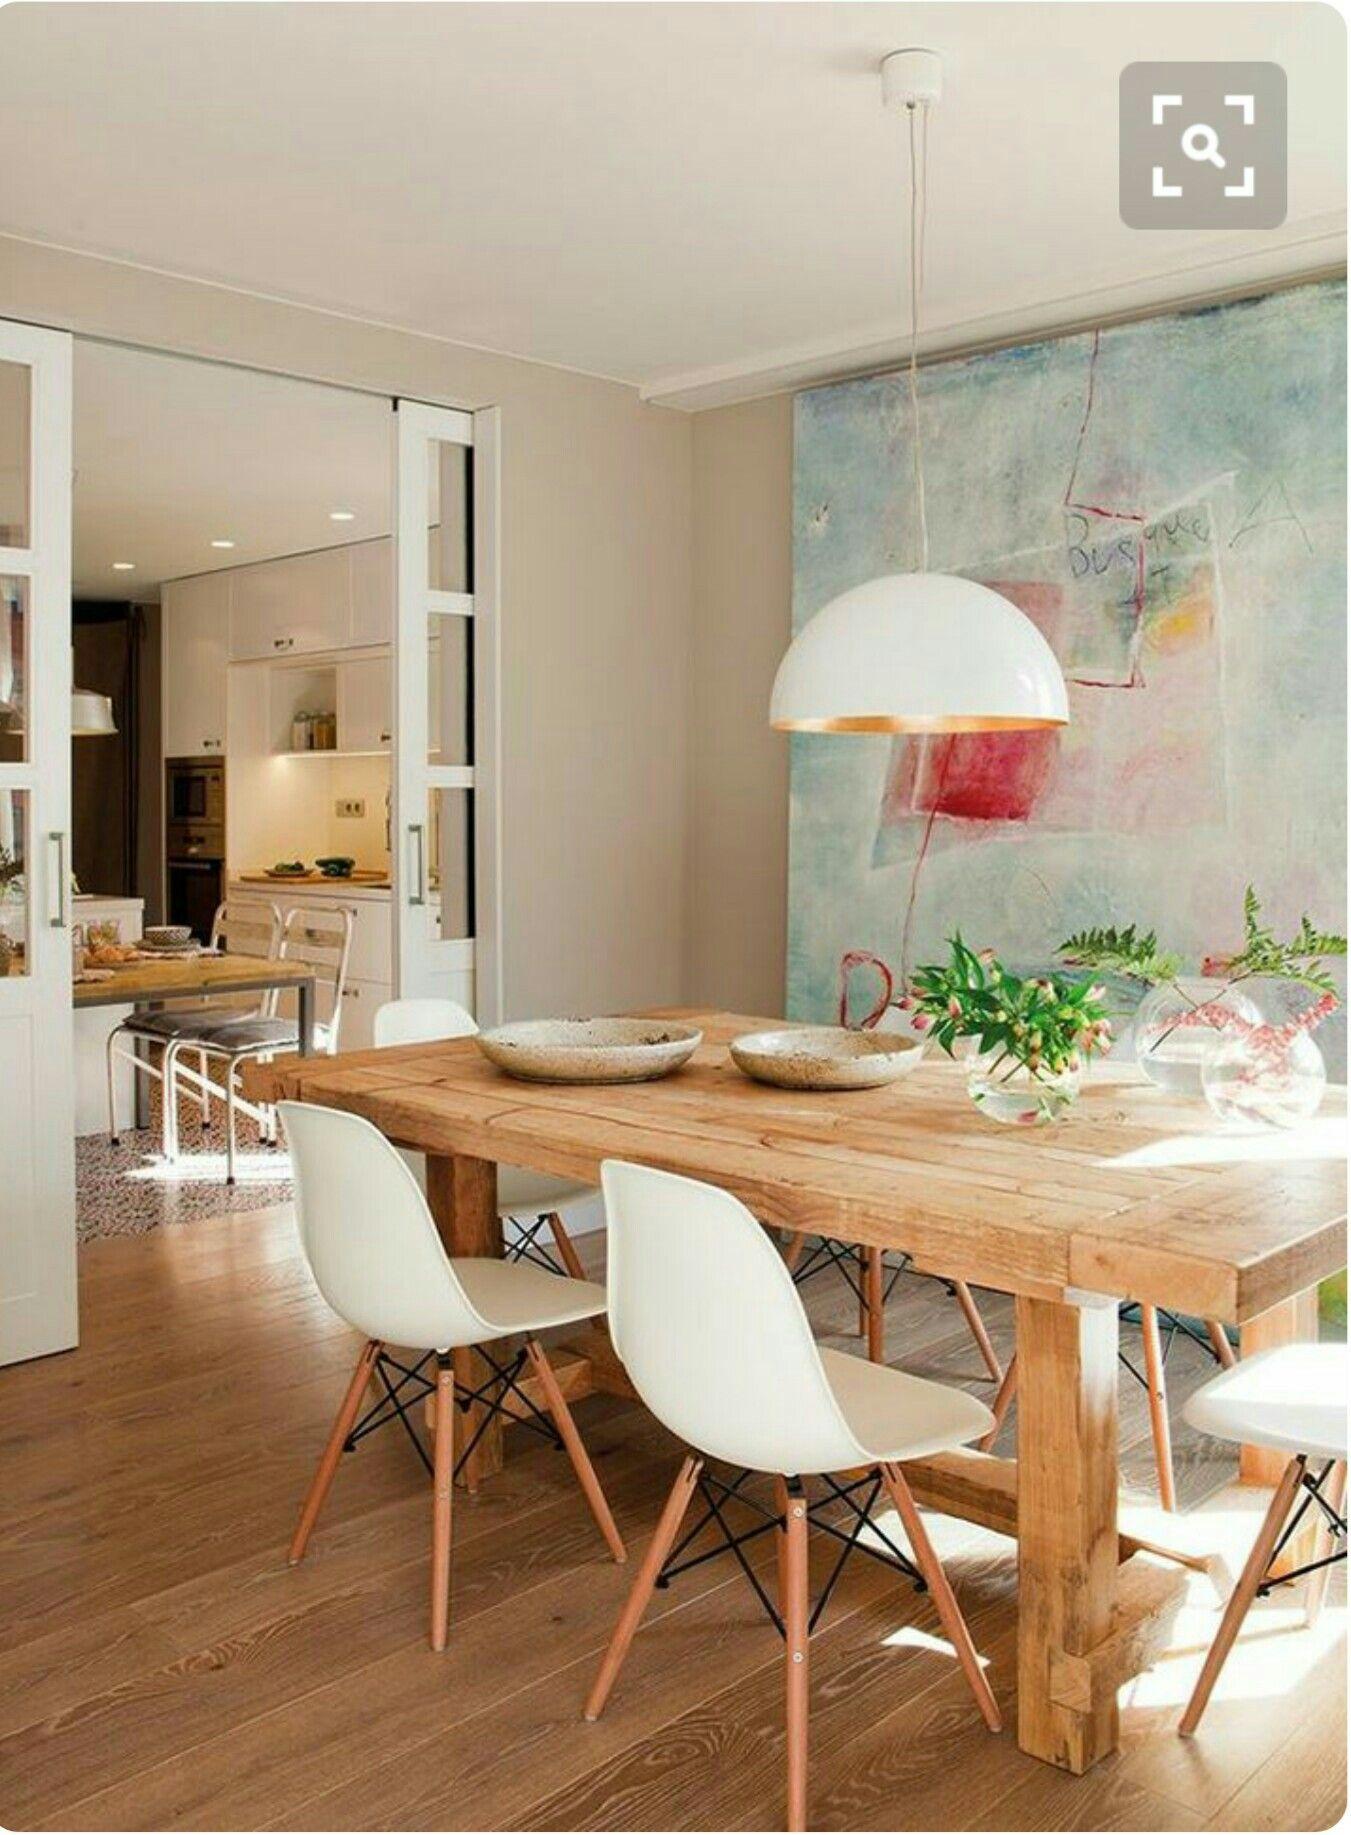 Pin von Rebeca Policastro auf Salas de estar / jantar | Pinterest